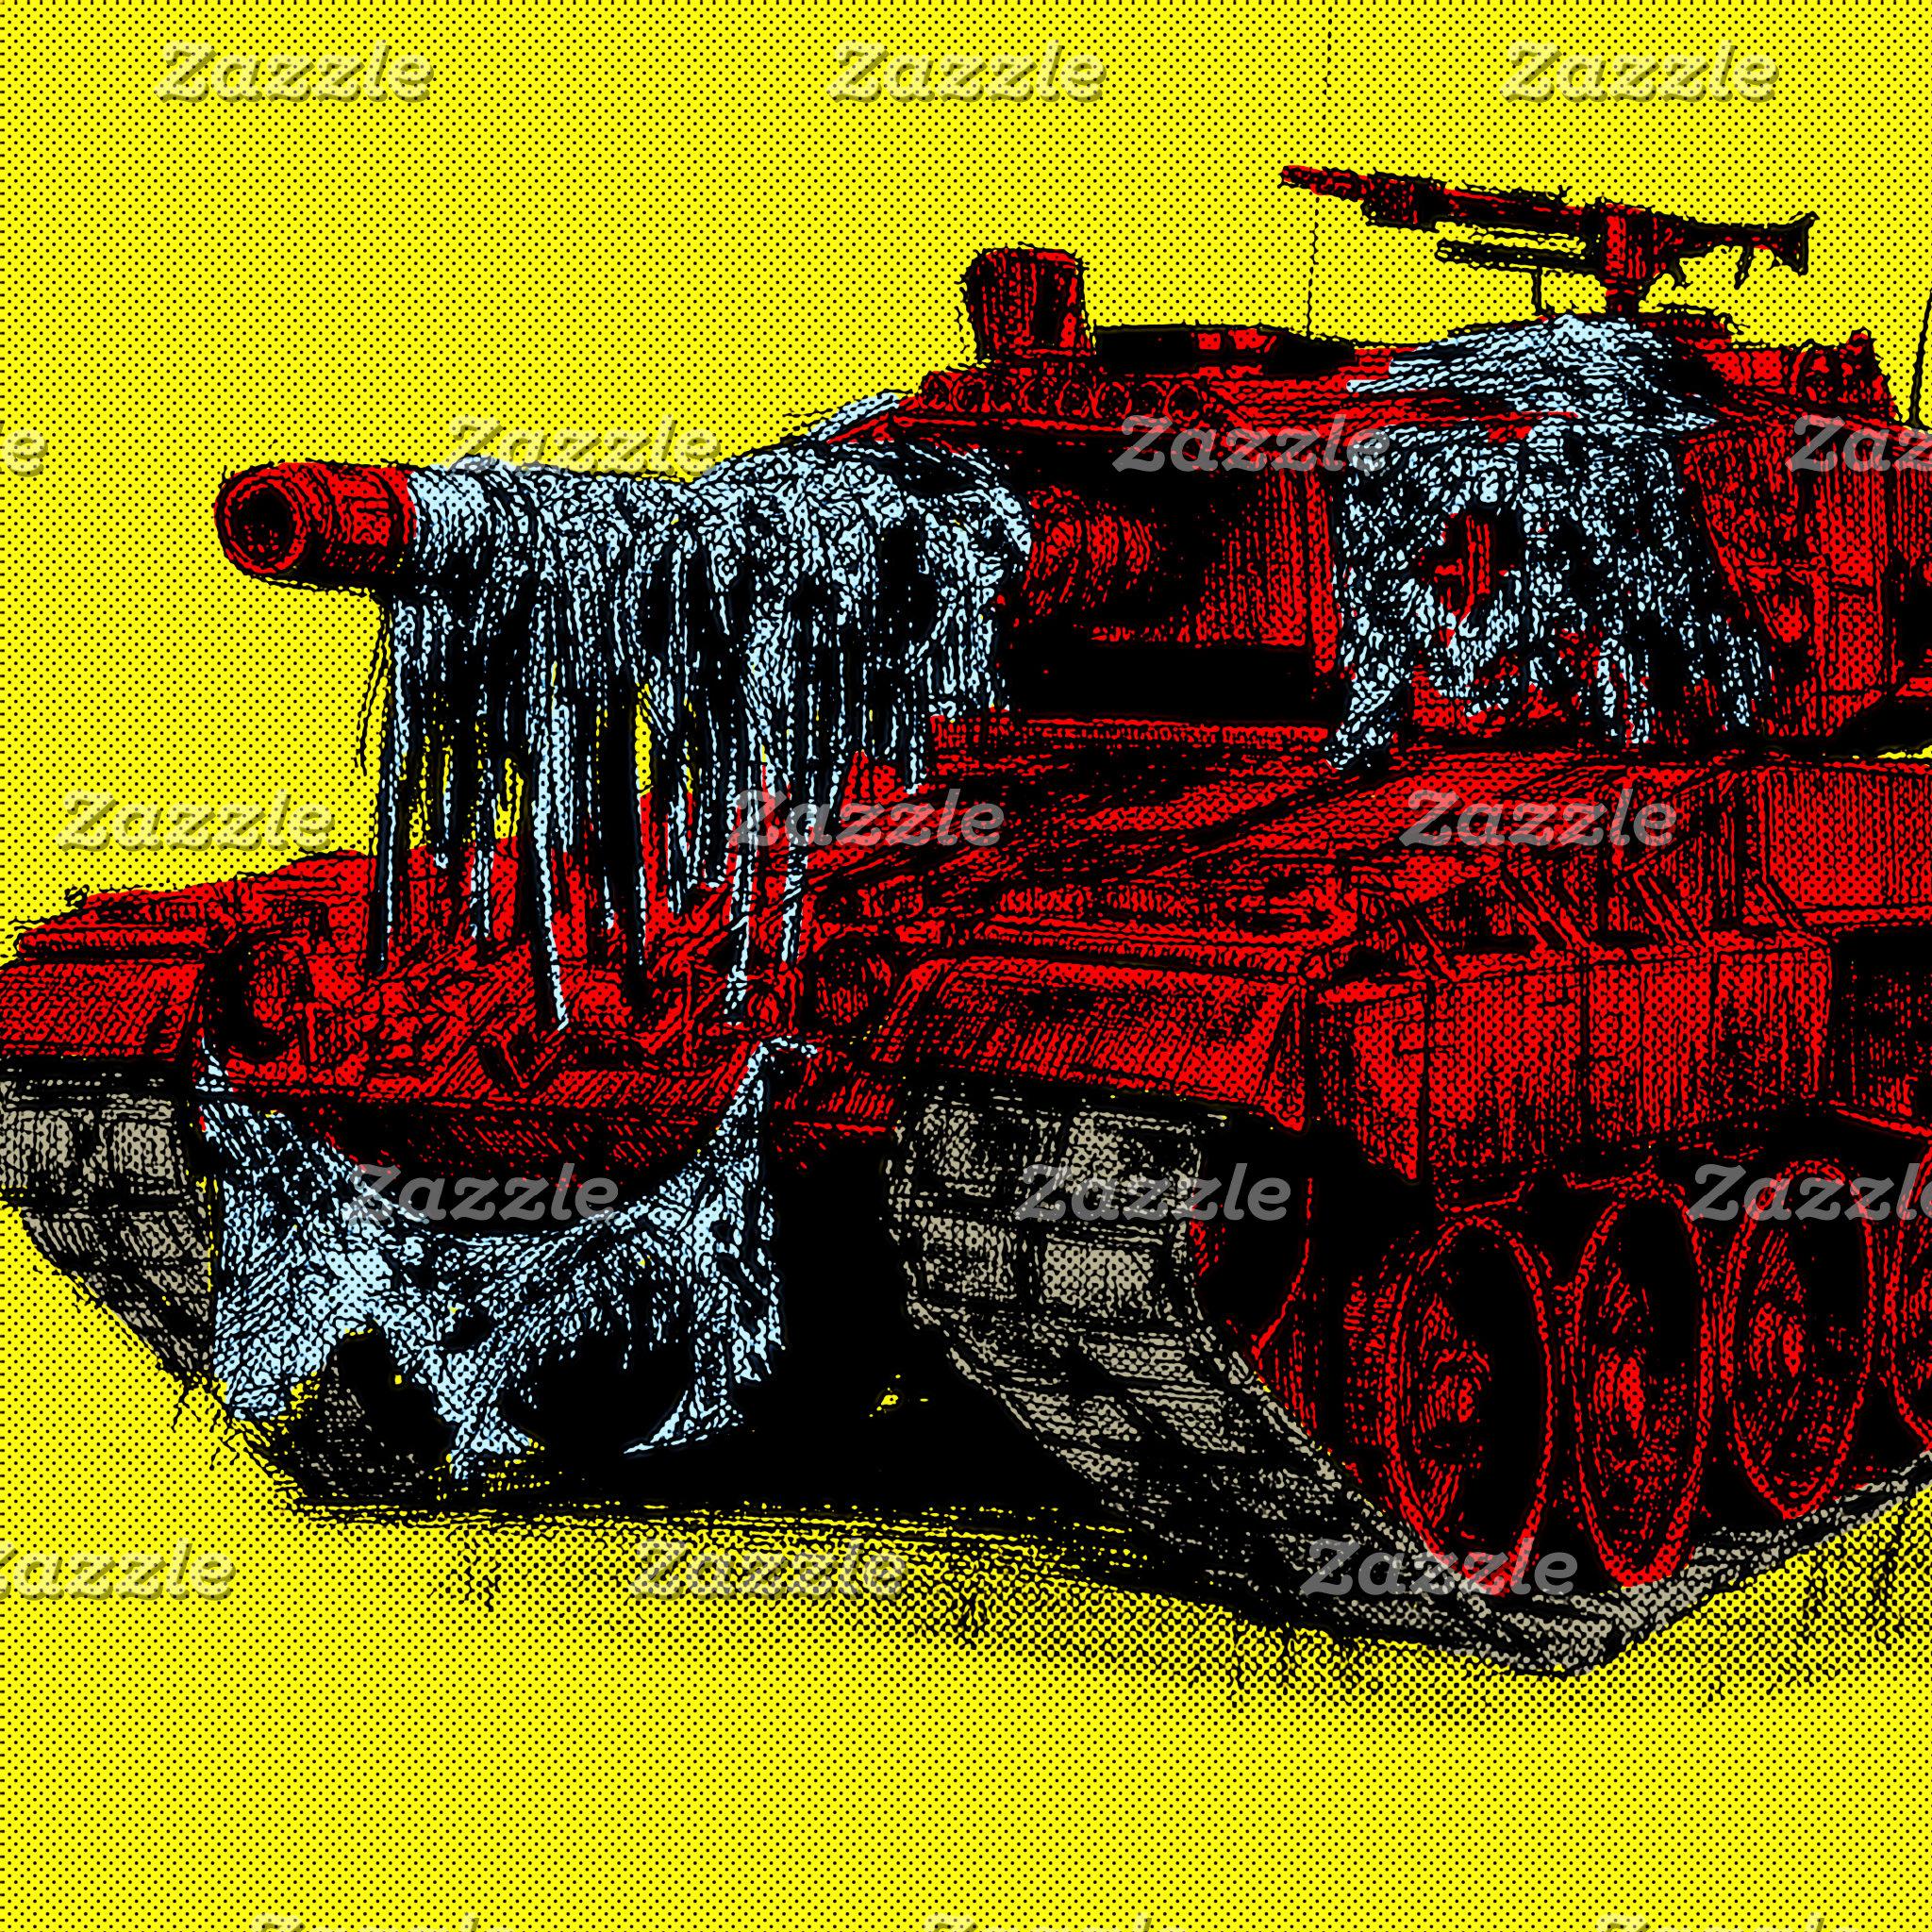 Pop Machine No. 1, half-tone yellow and red tank